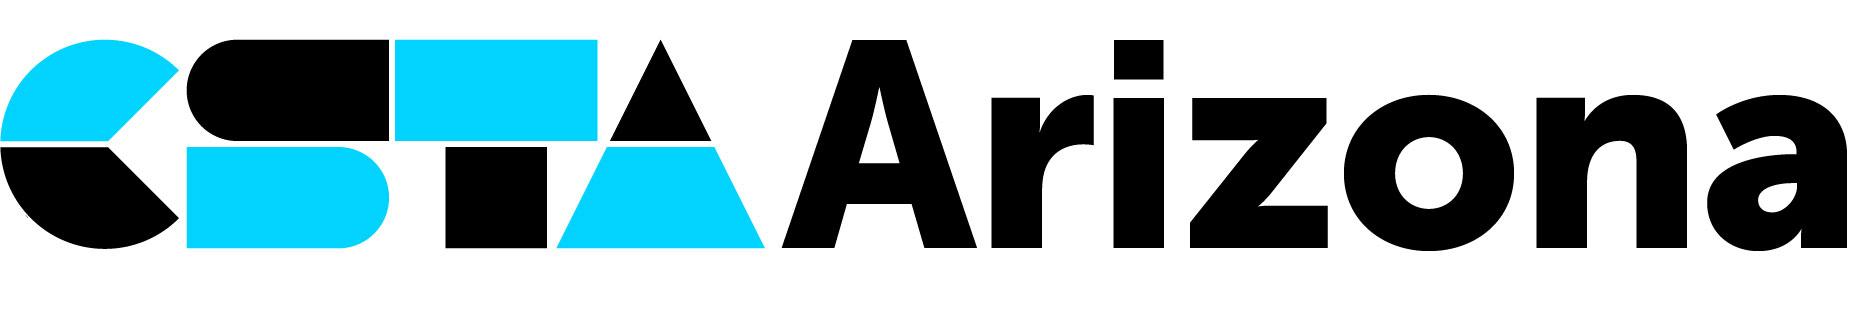 CSTA Arizona logo